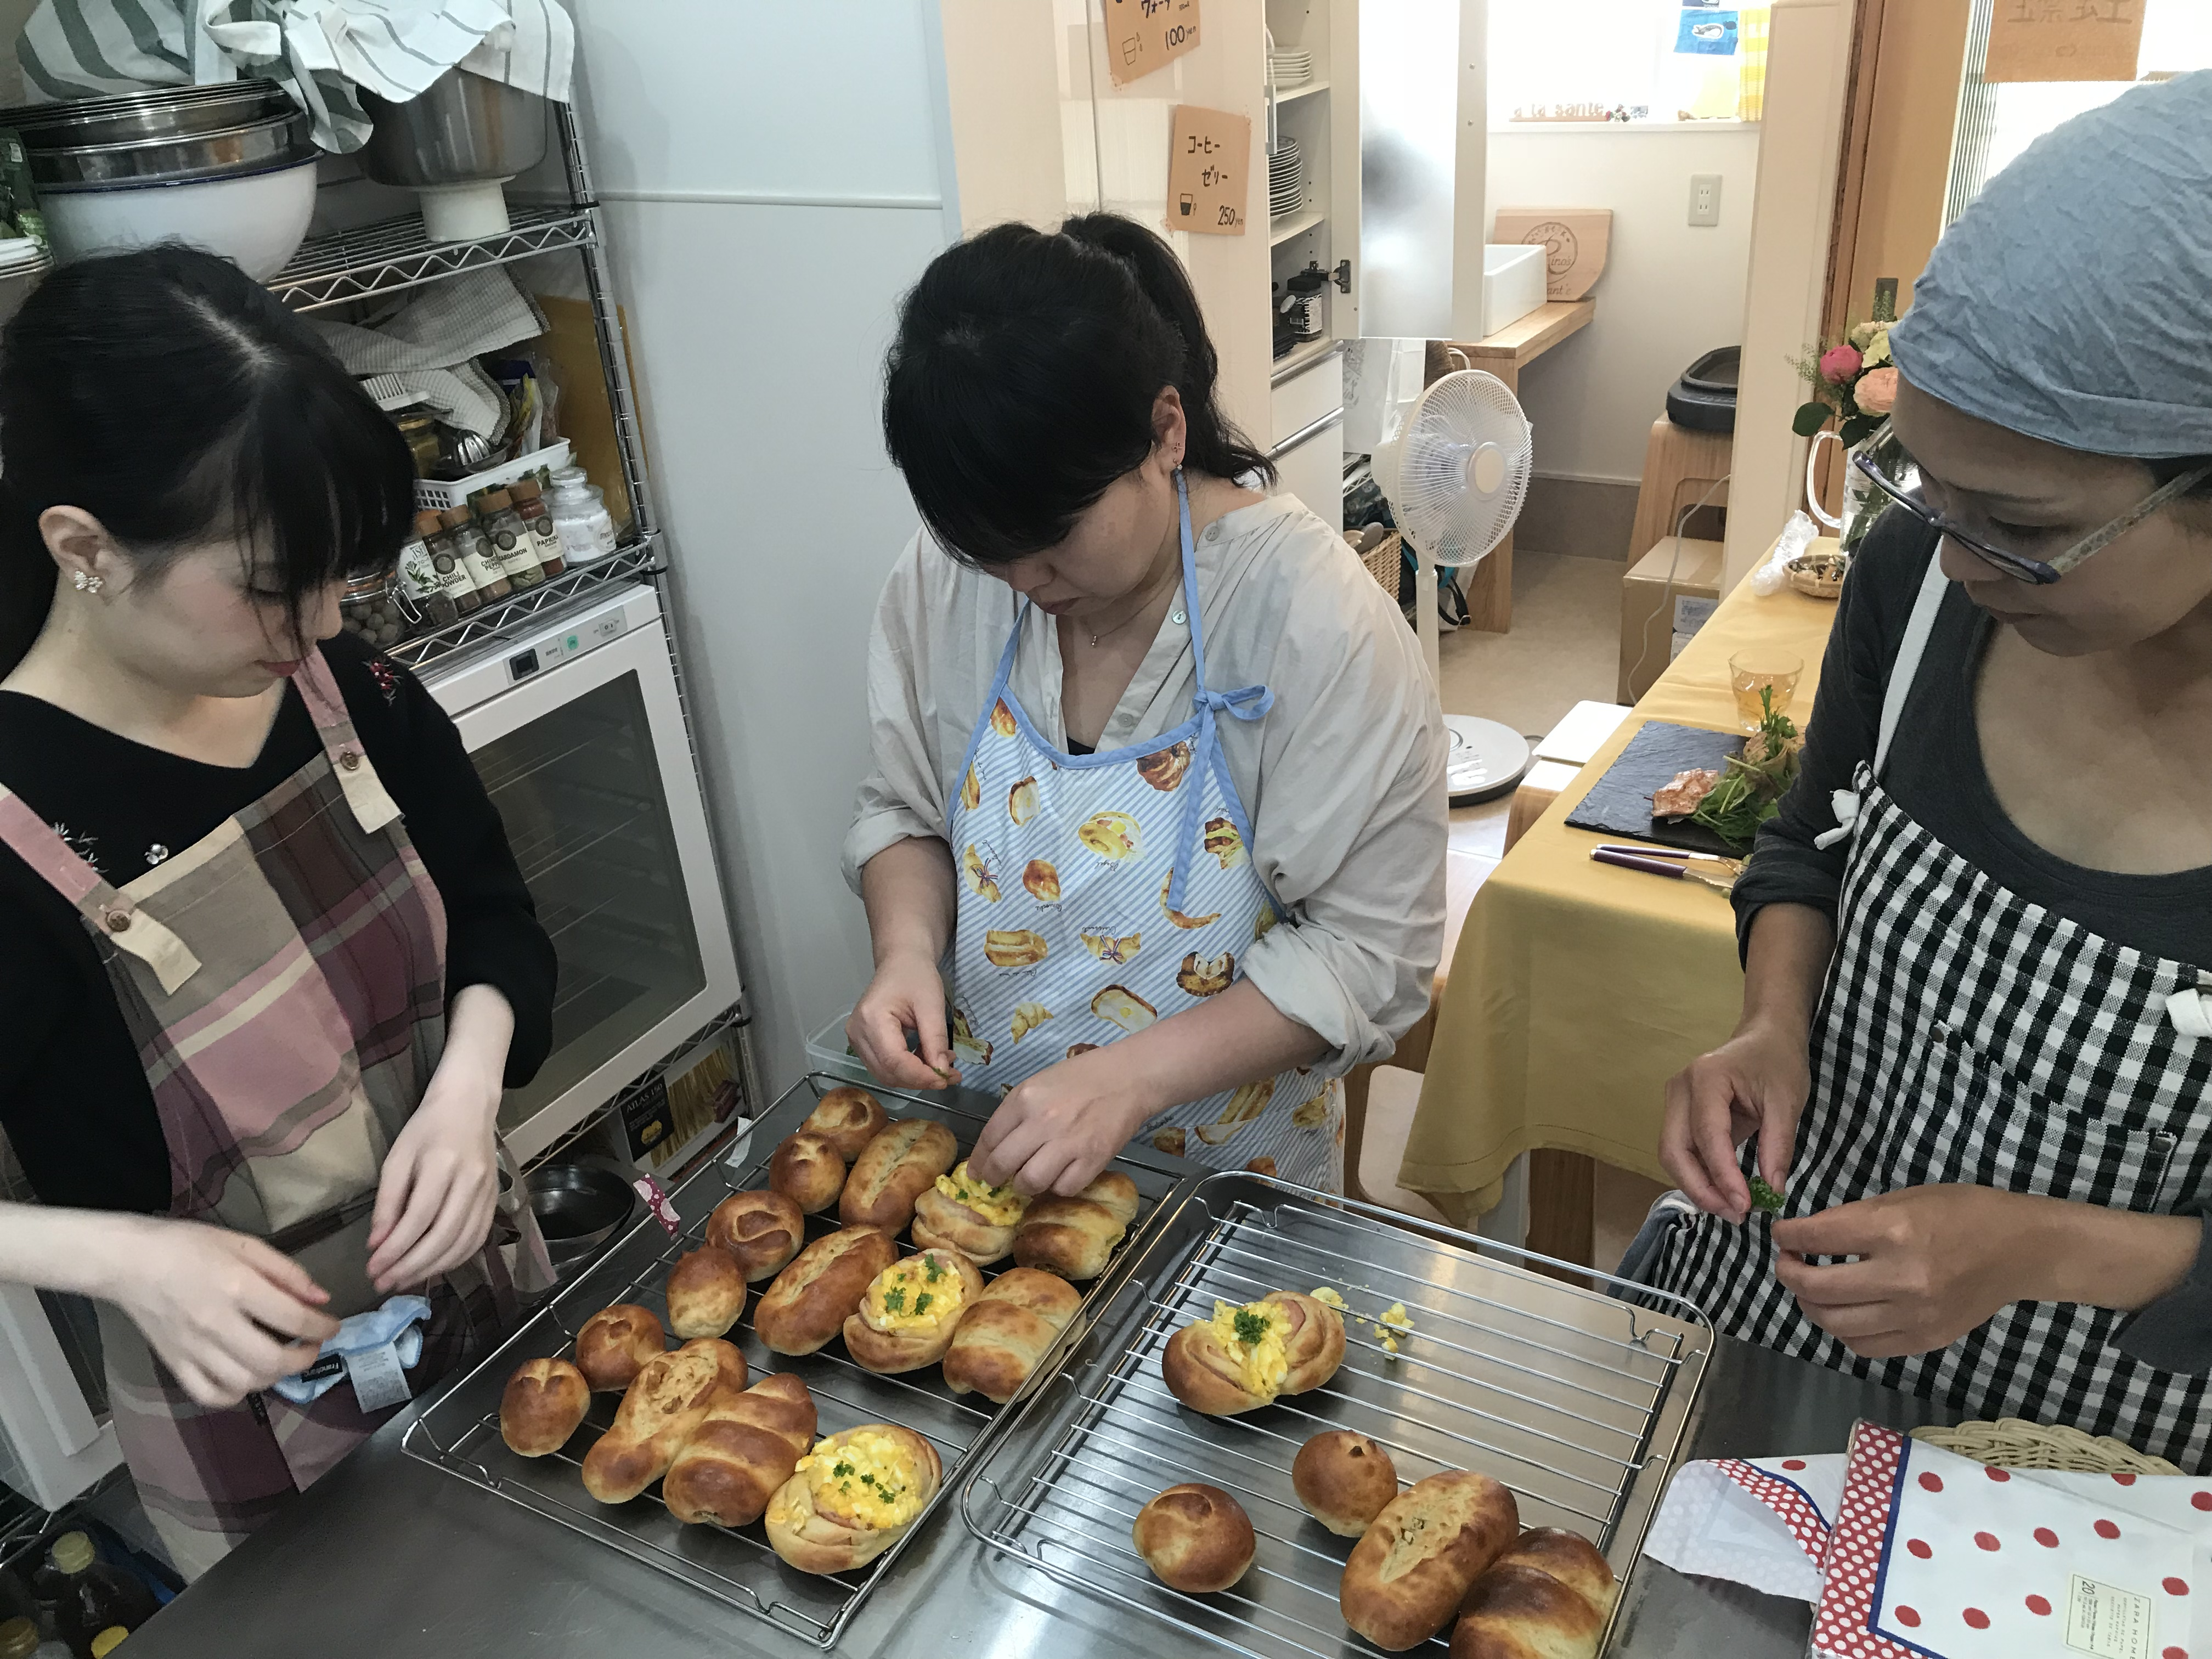 a-ta-sante糖質制限パン料理教室。阿倍野区。桃ヶ池町。a-ta-sant'e.京都江部粉糖質オフパン。パン体験会。利野郁枝。